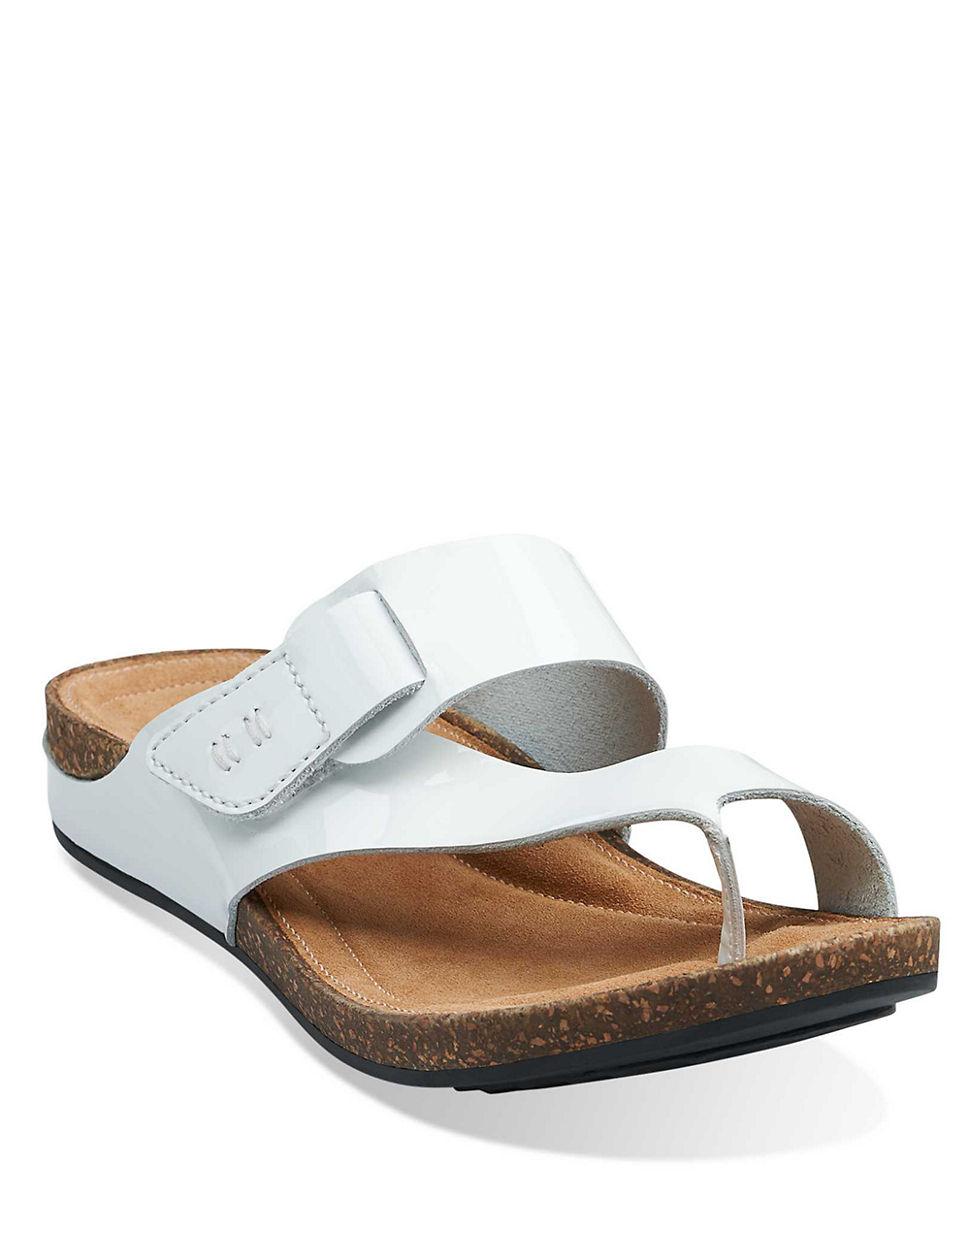 Aerosole Sandals Perri Coast Clarks Sandals